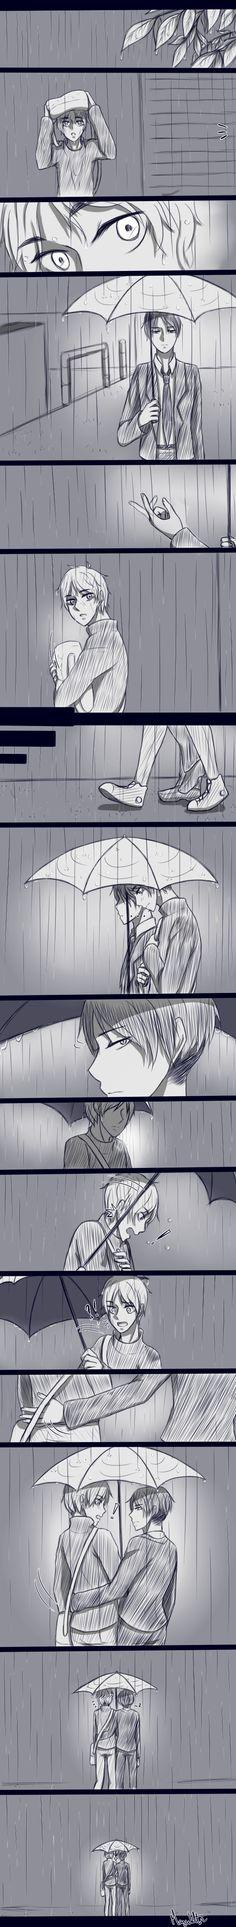 Rain~ by magickitt on DeviantArt | Ereri | Eren x Levi ❤️.❤️ Attack on Titan